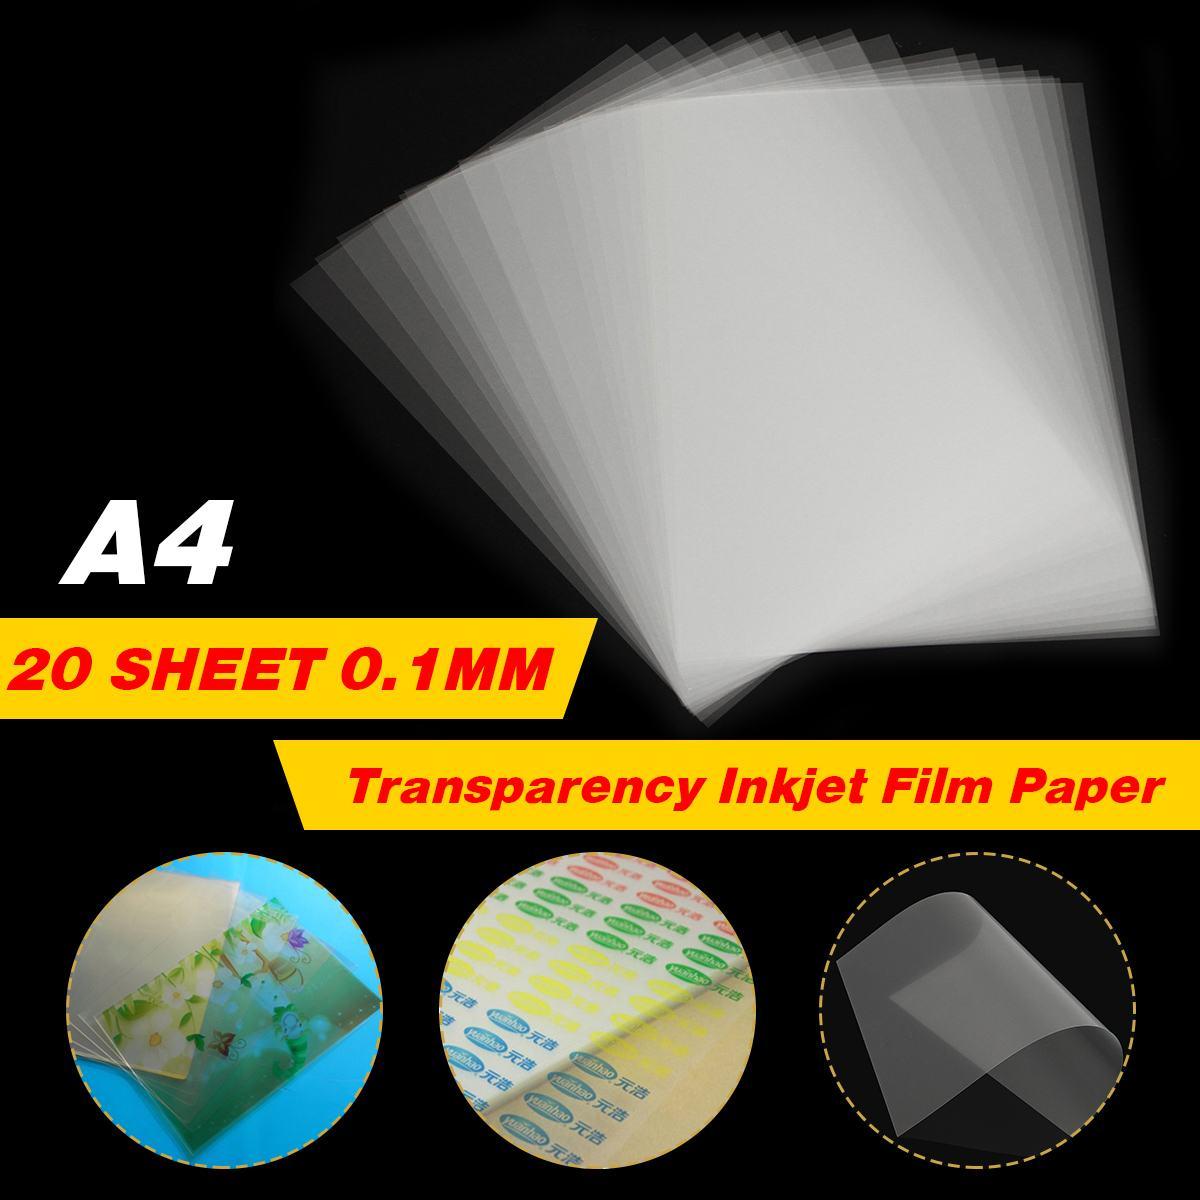 20 Sheet A4 Transparent Inkjet Film Paper Screen Printing Print Stencil Design 29.6 X 21cm Non-waterproof Thickness 0.12mm